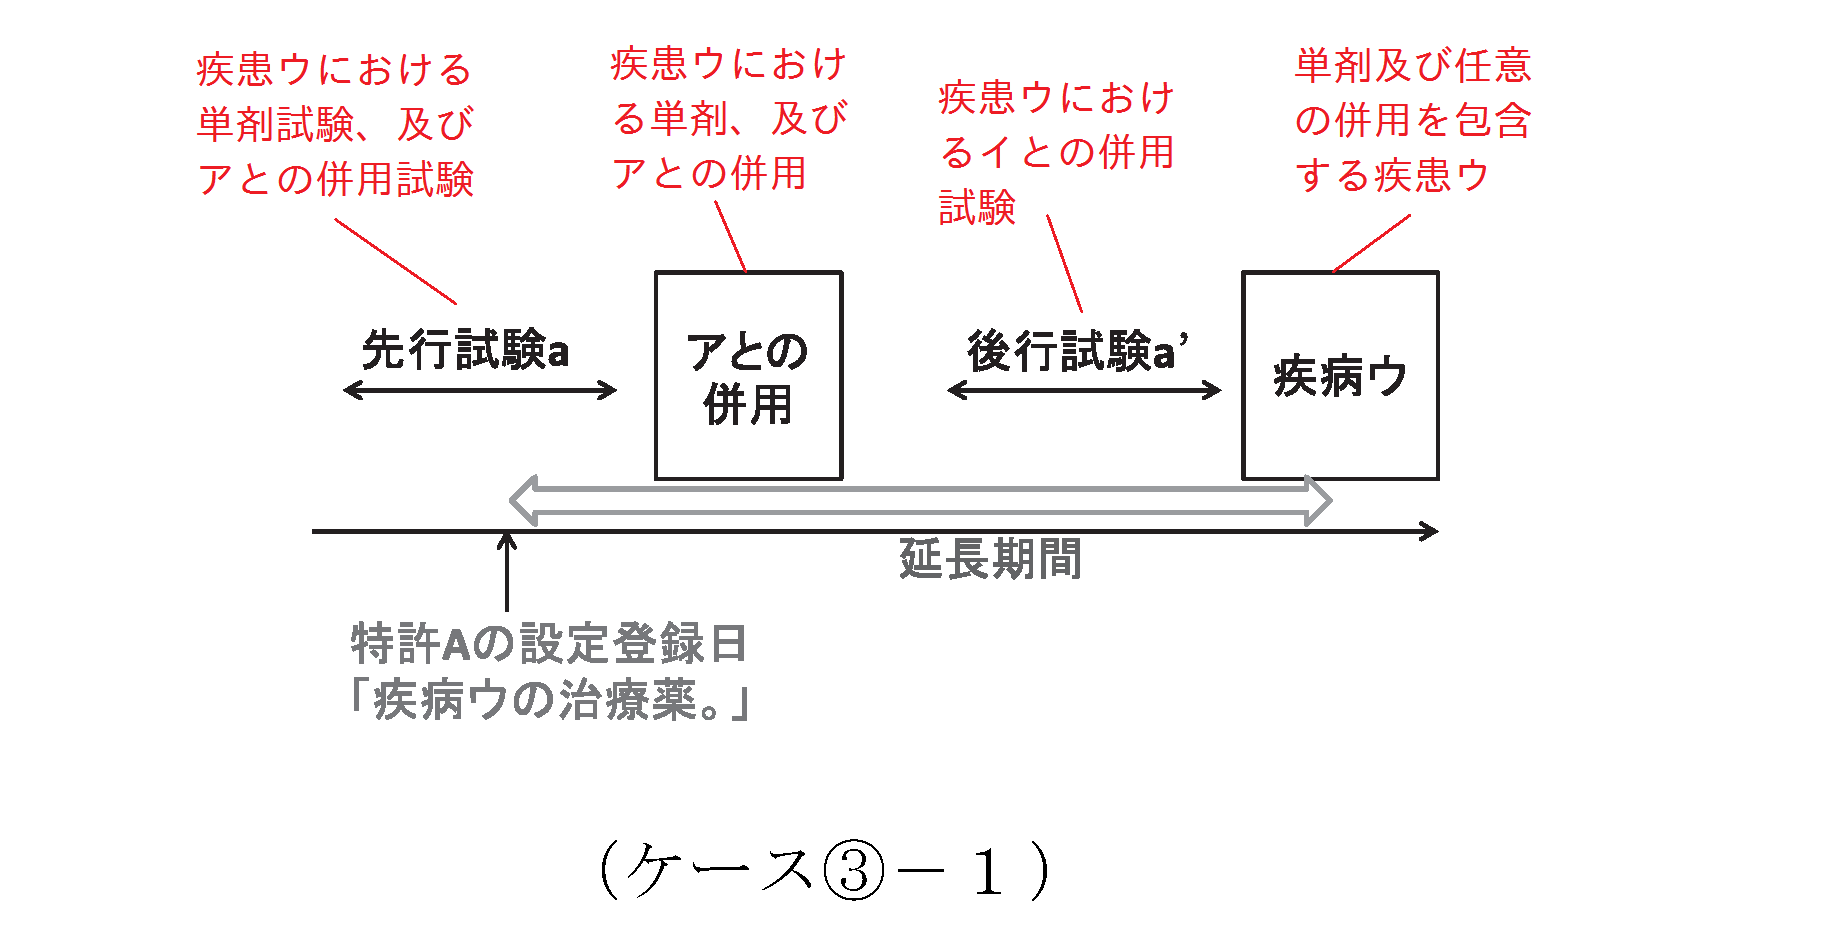 2020shimizu_fig21Ln1.png